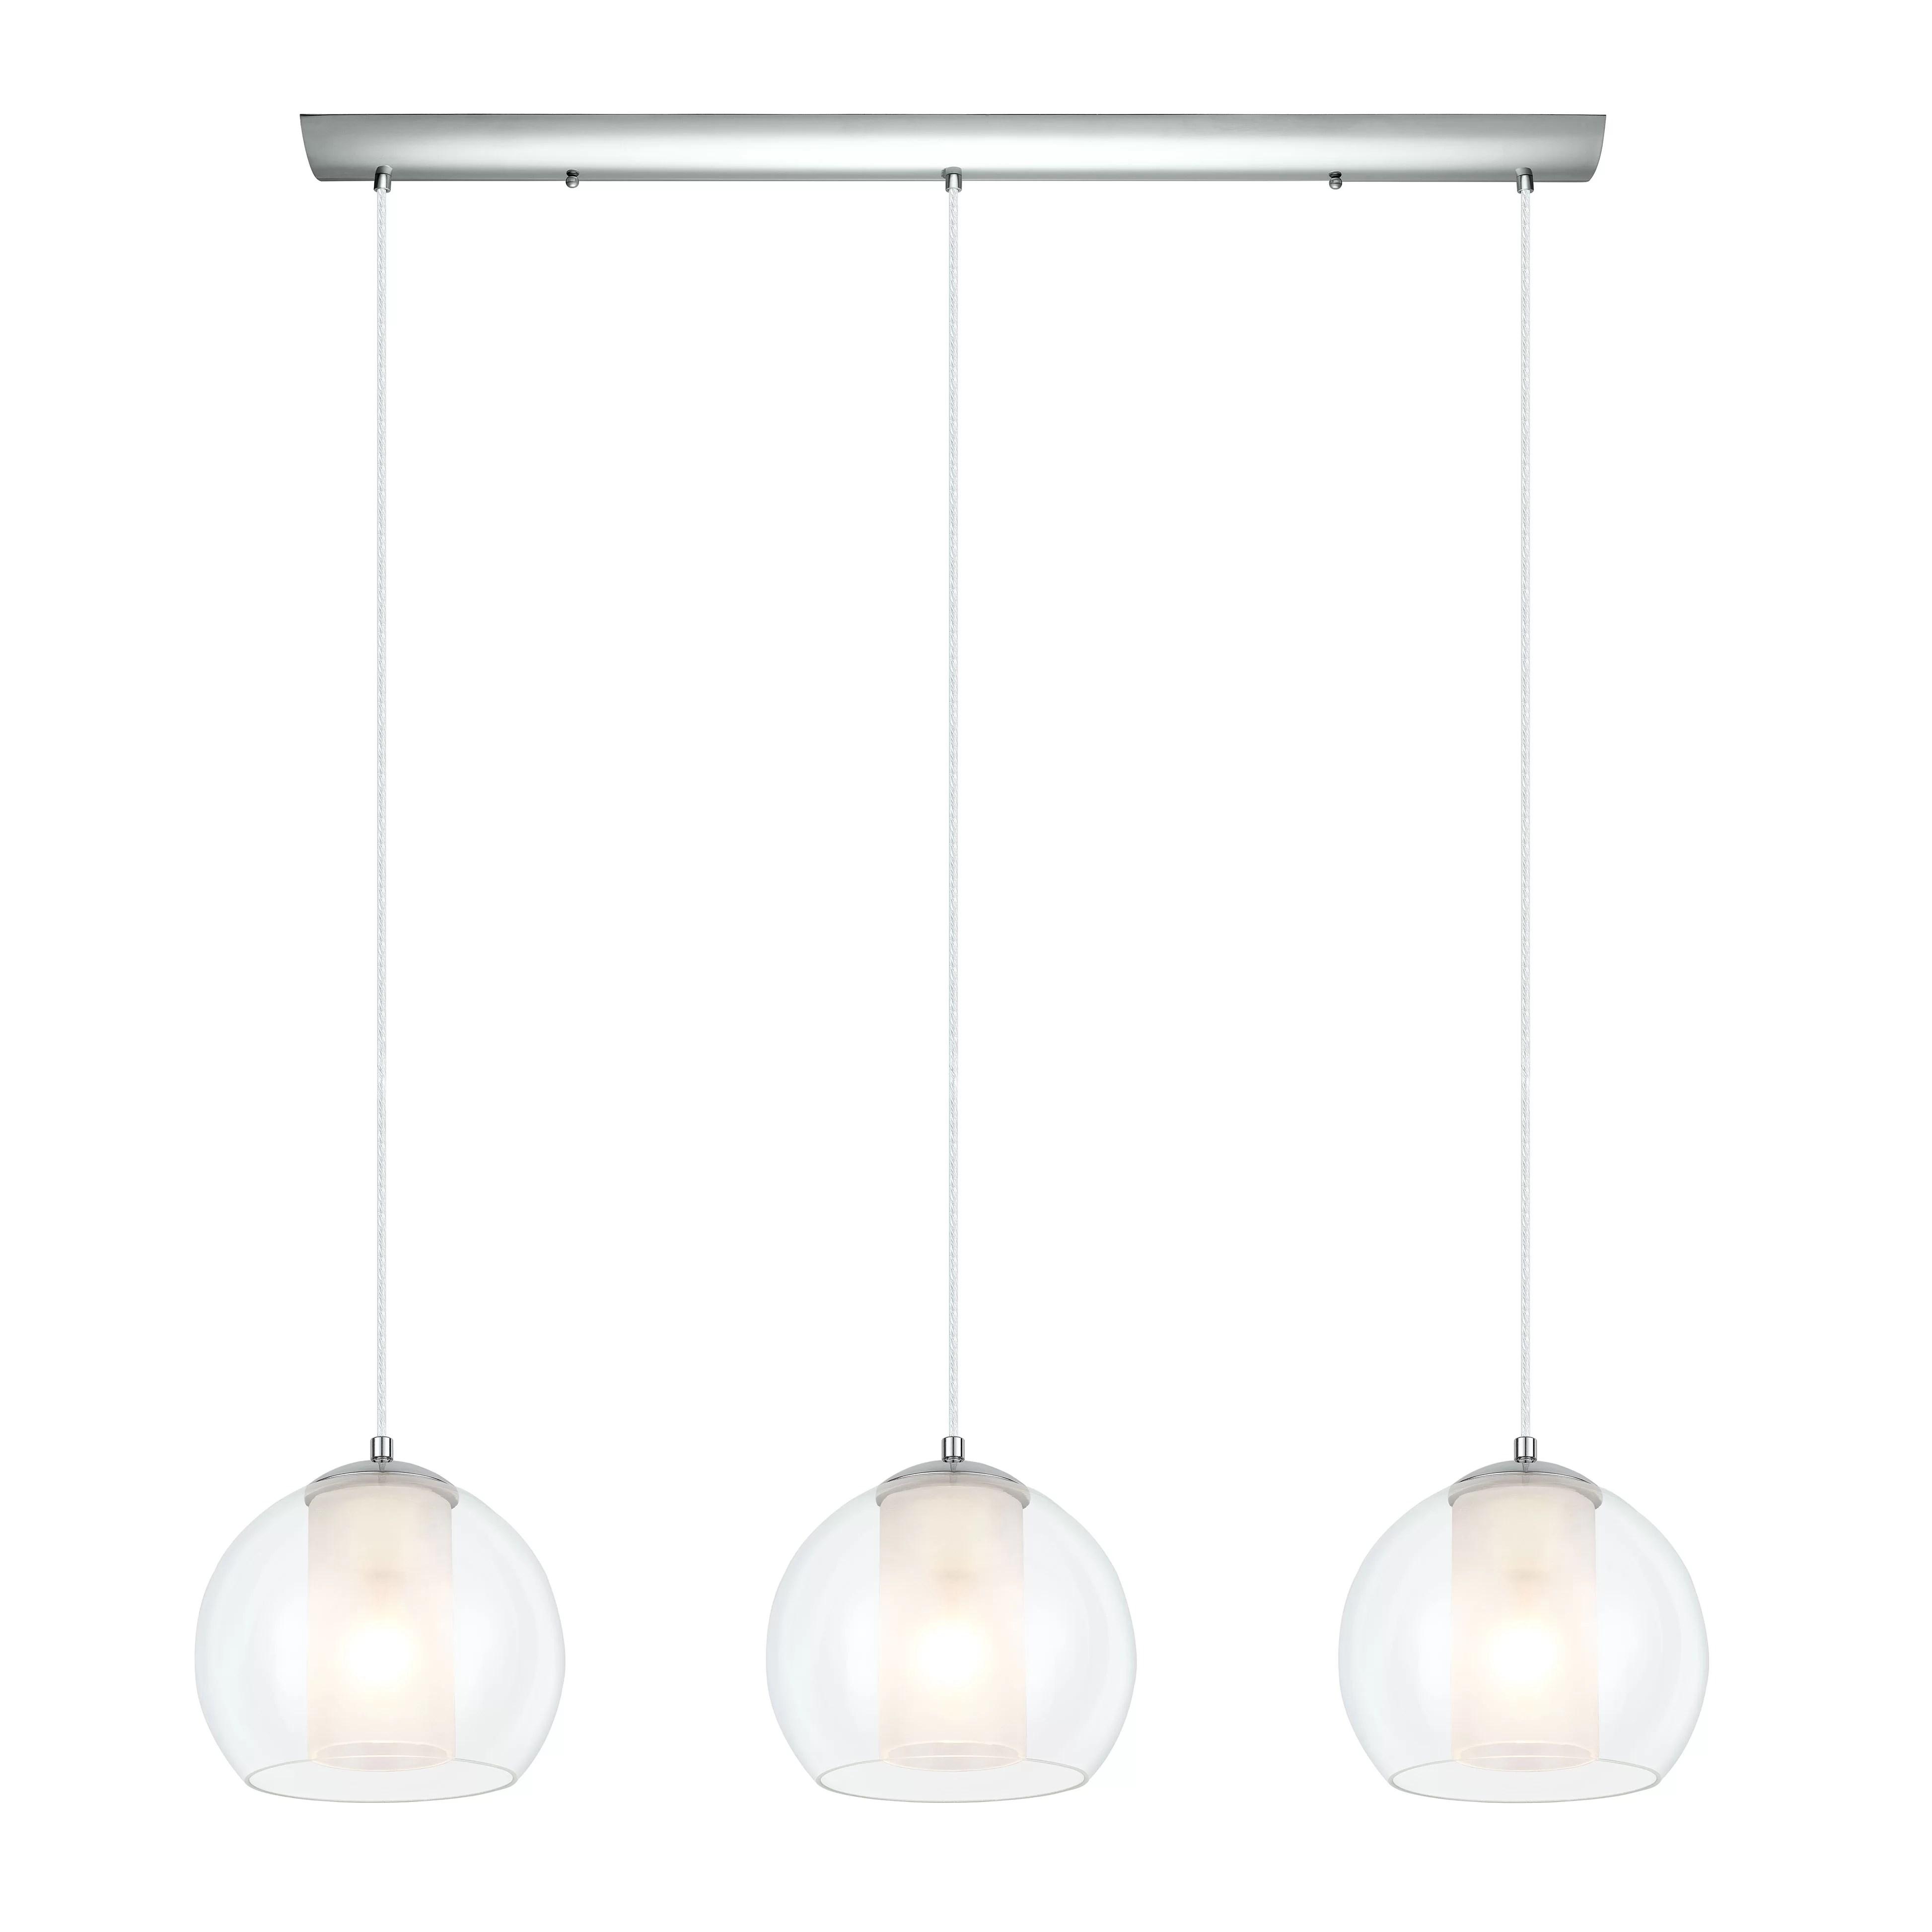 3 light kitchen island pendant top corner cabinet eglo bolsano and reviews